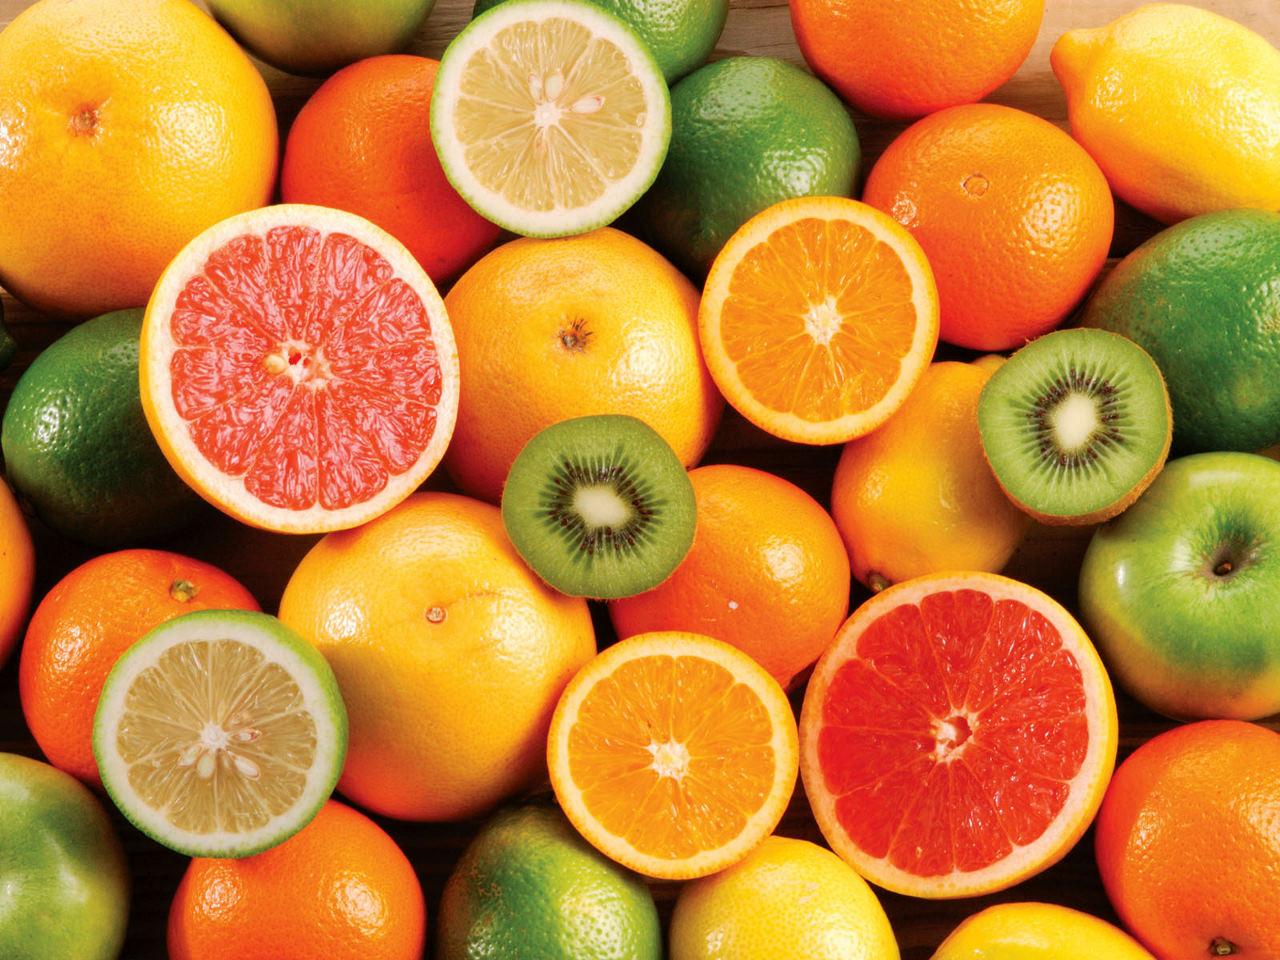 http://4.bp.blogspot.com/-lC_Yz_vb5SY/UFzF8UyetrI/AAAAAAAAB8E/goBR8_ZaR7Y/s1600/Fruits-hd-wallpapers%20%20(42).jpg